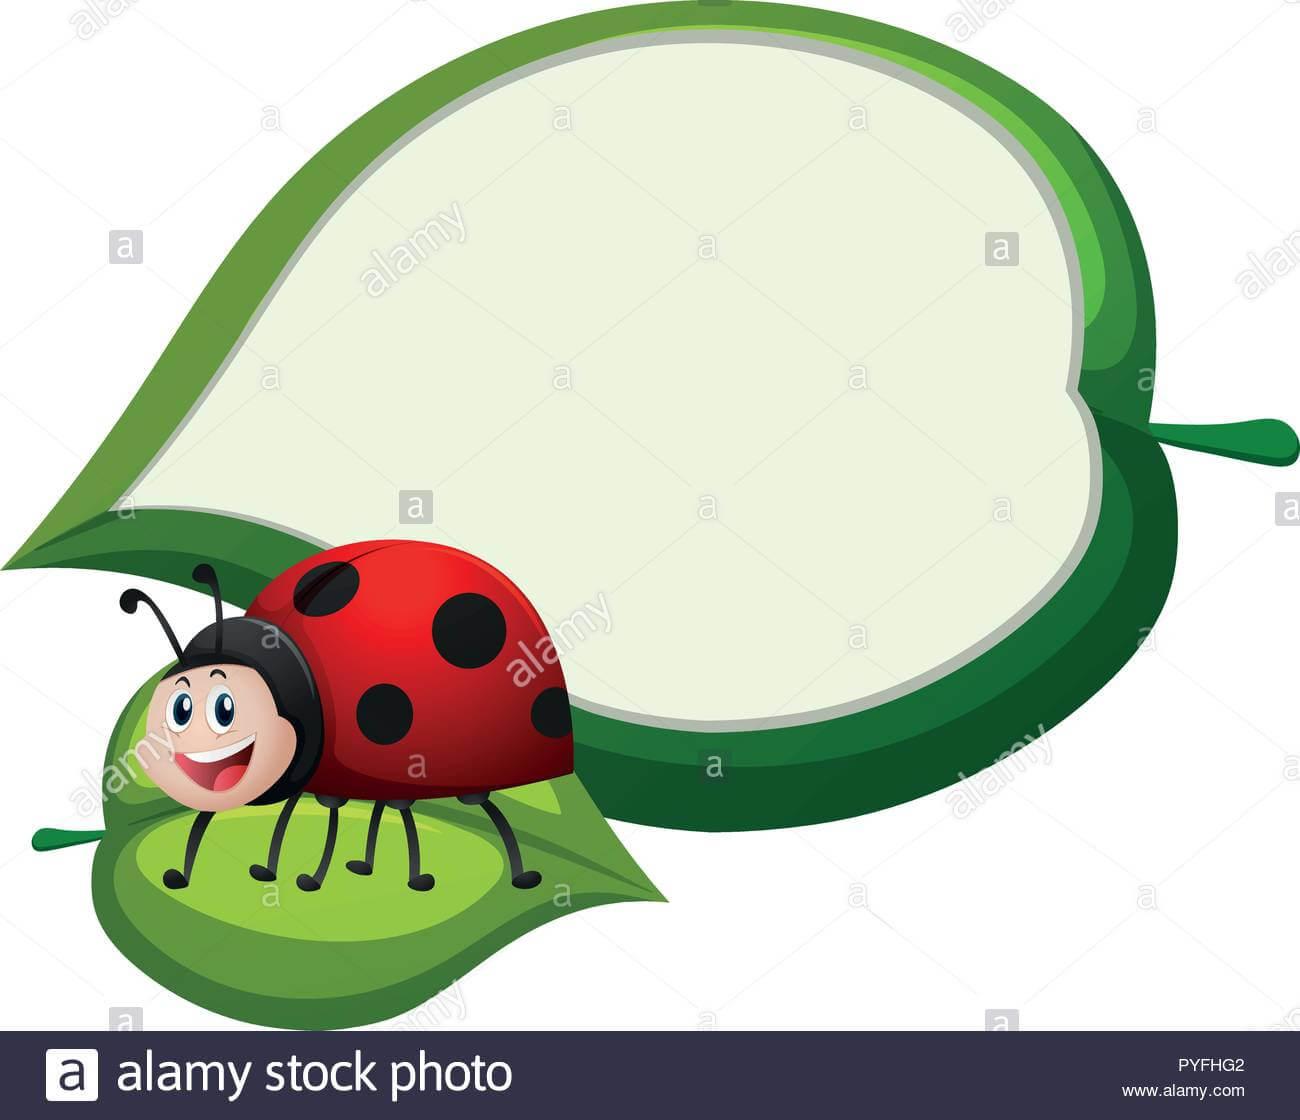 Border Template With Ladybug On Leaf Illustration Stock In Blank Ladybug Template